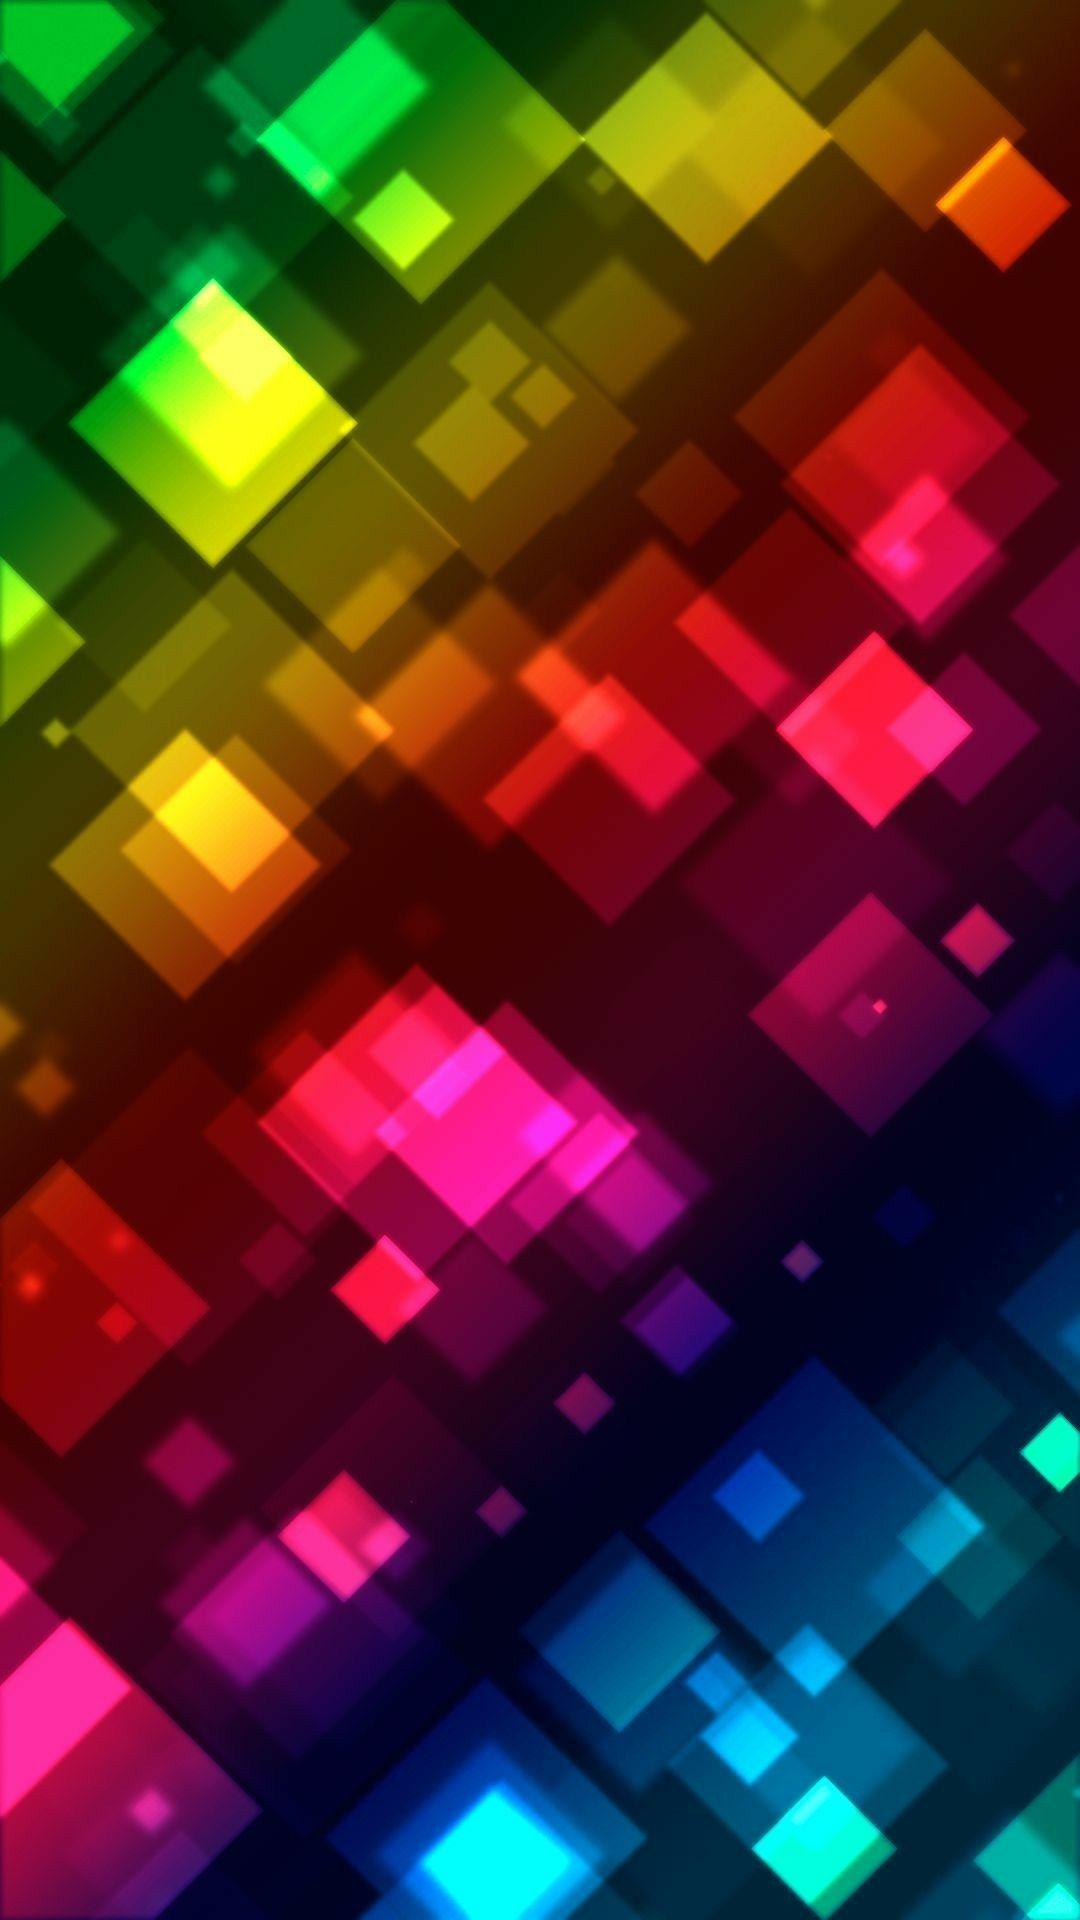 Most Inspiring Wallpaper Mobile Colorful - ed25eb8184f2d606eeef54906b93a947  2018_1912.jpg